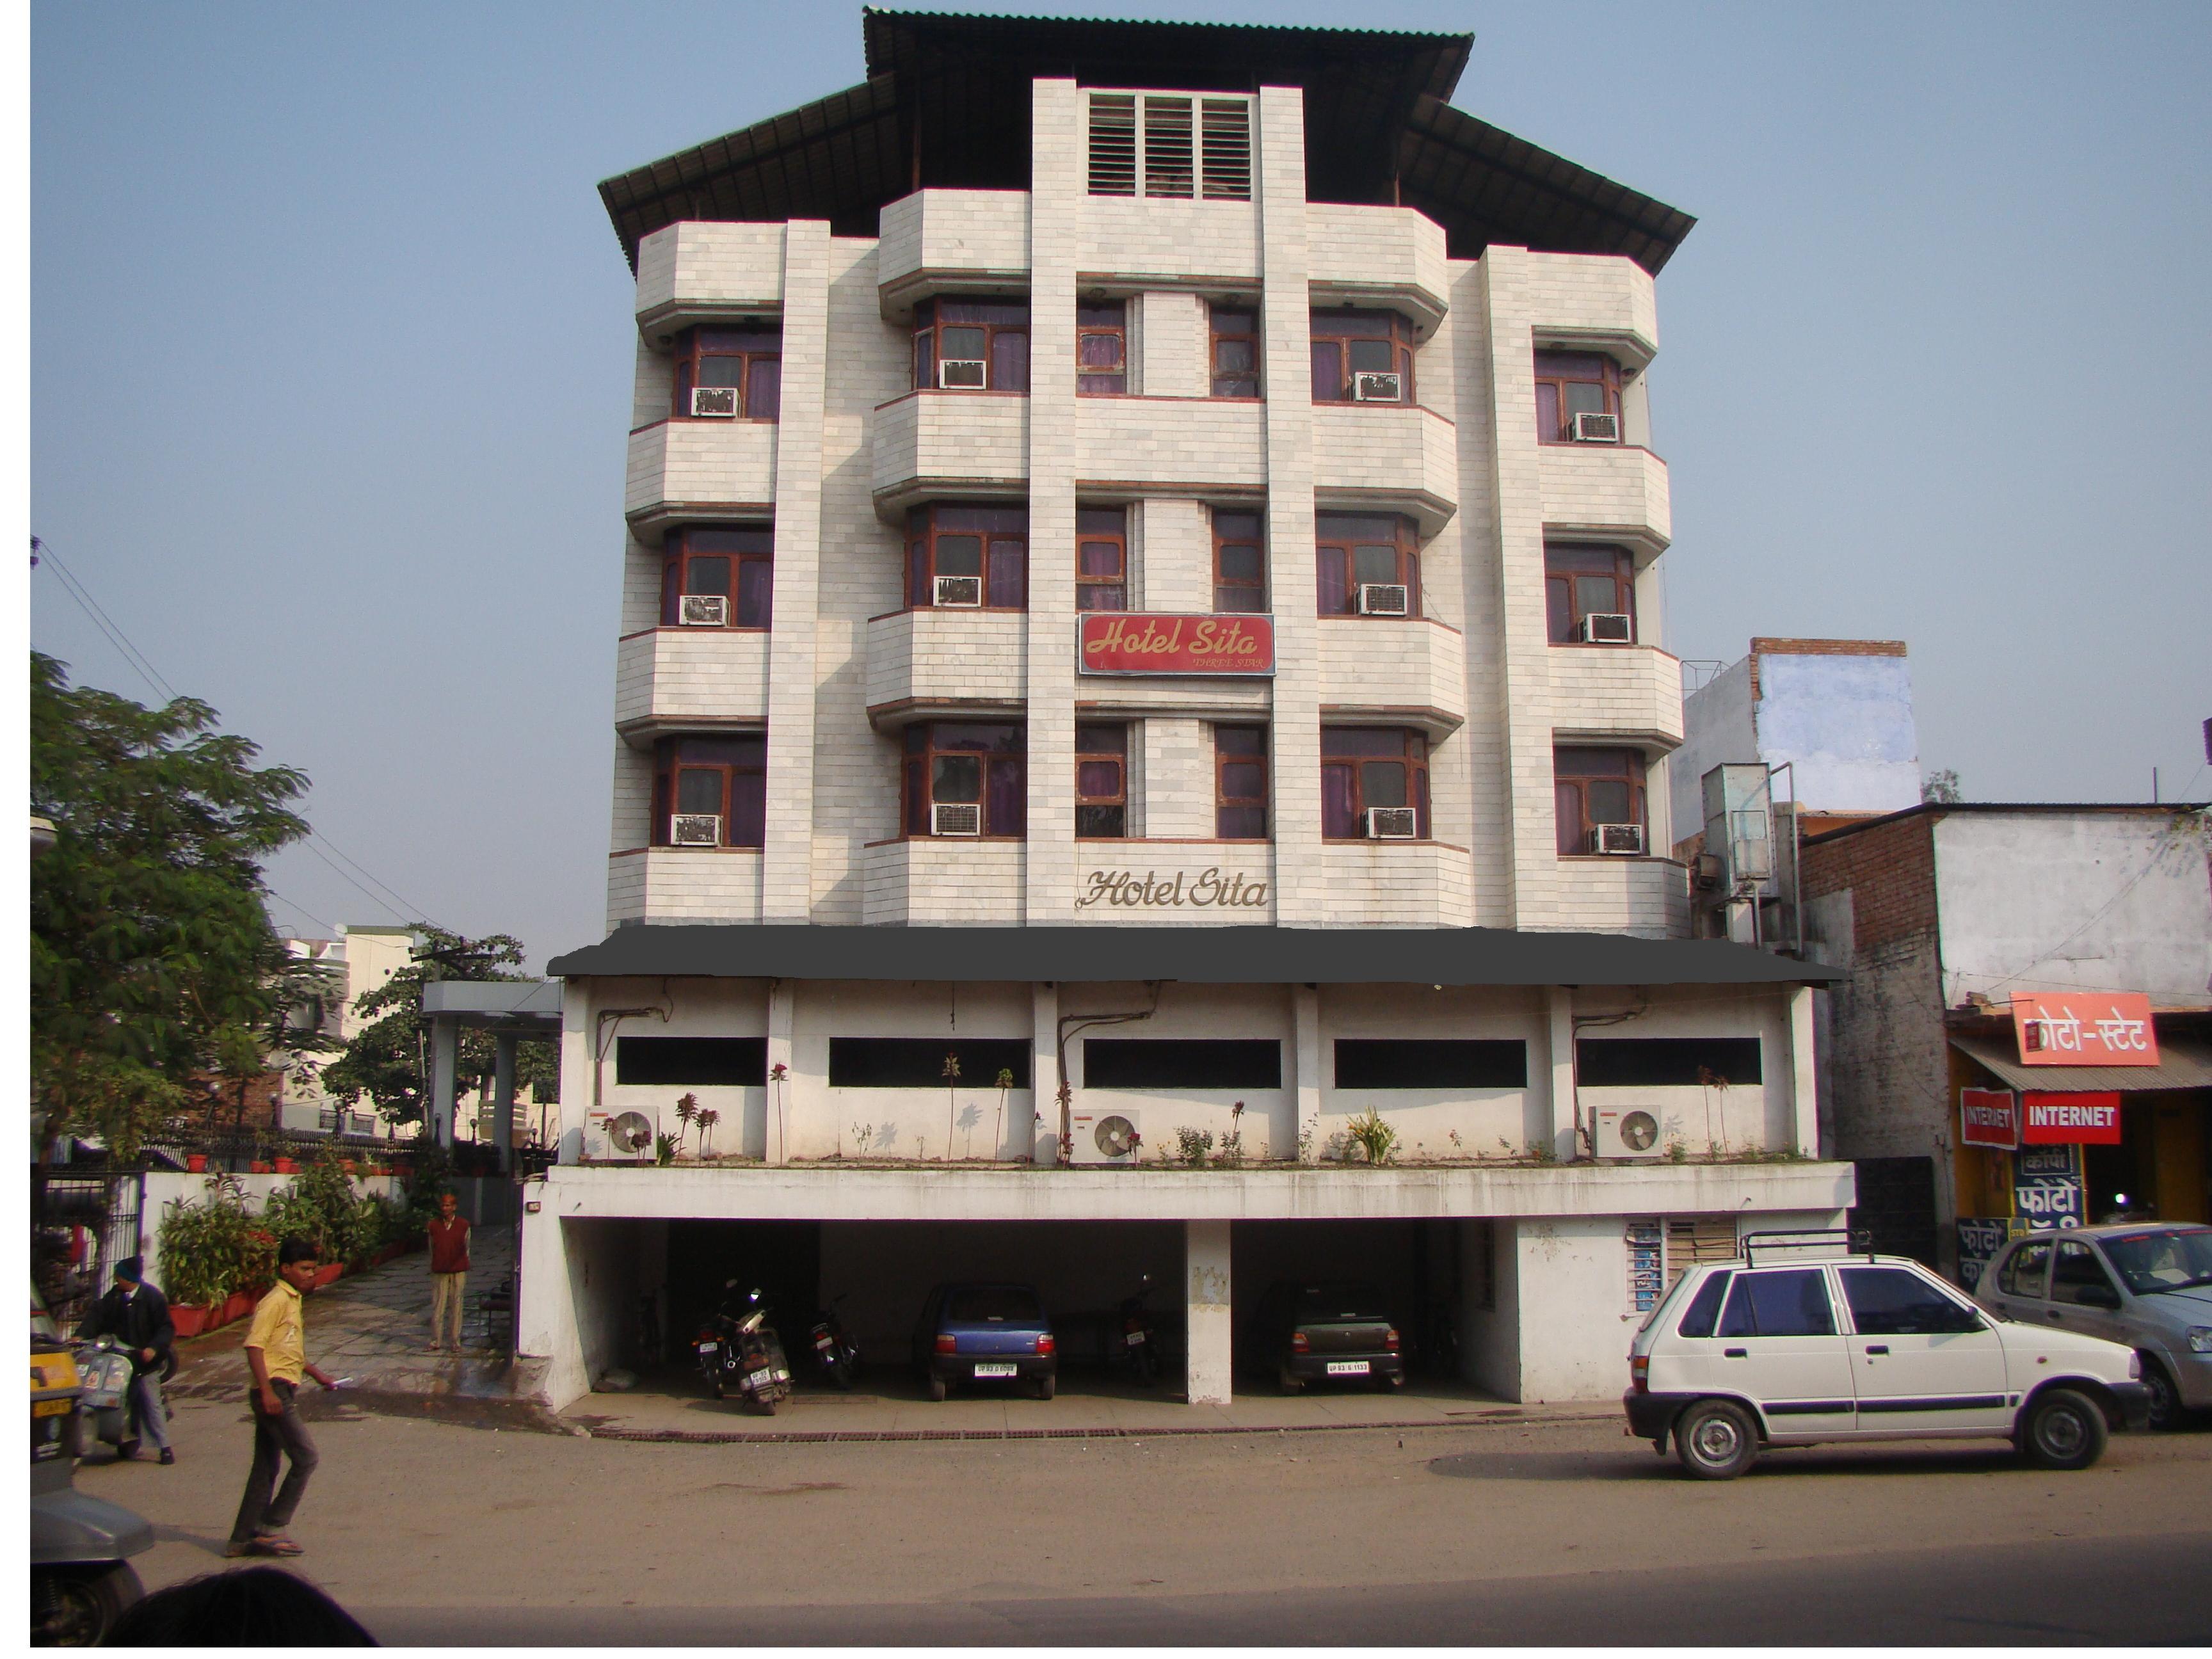 Hotel Sita in Orchha